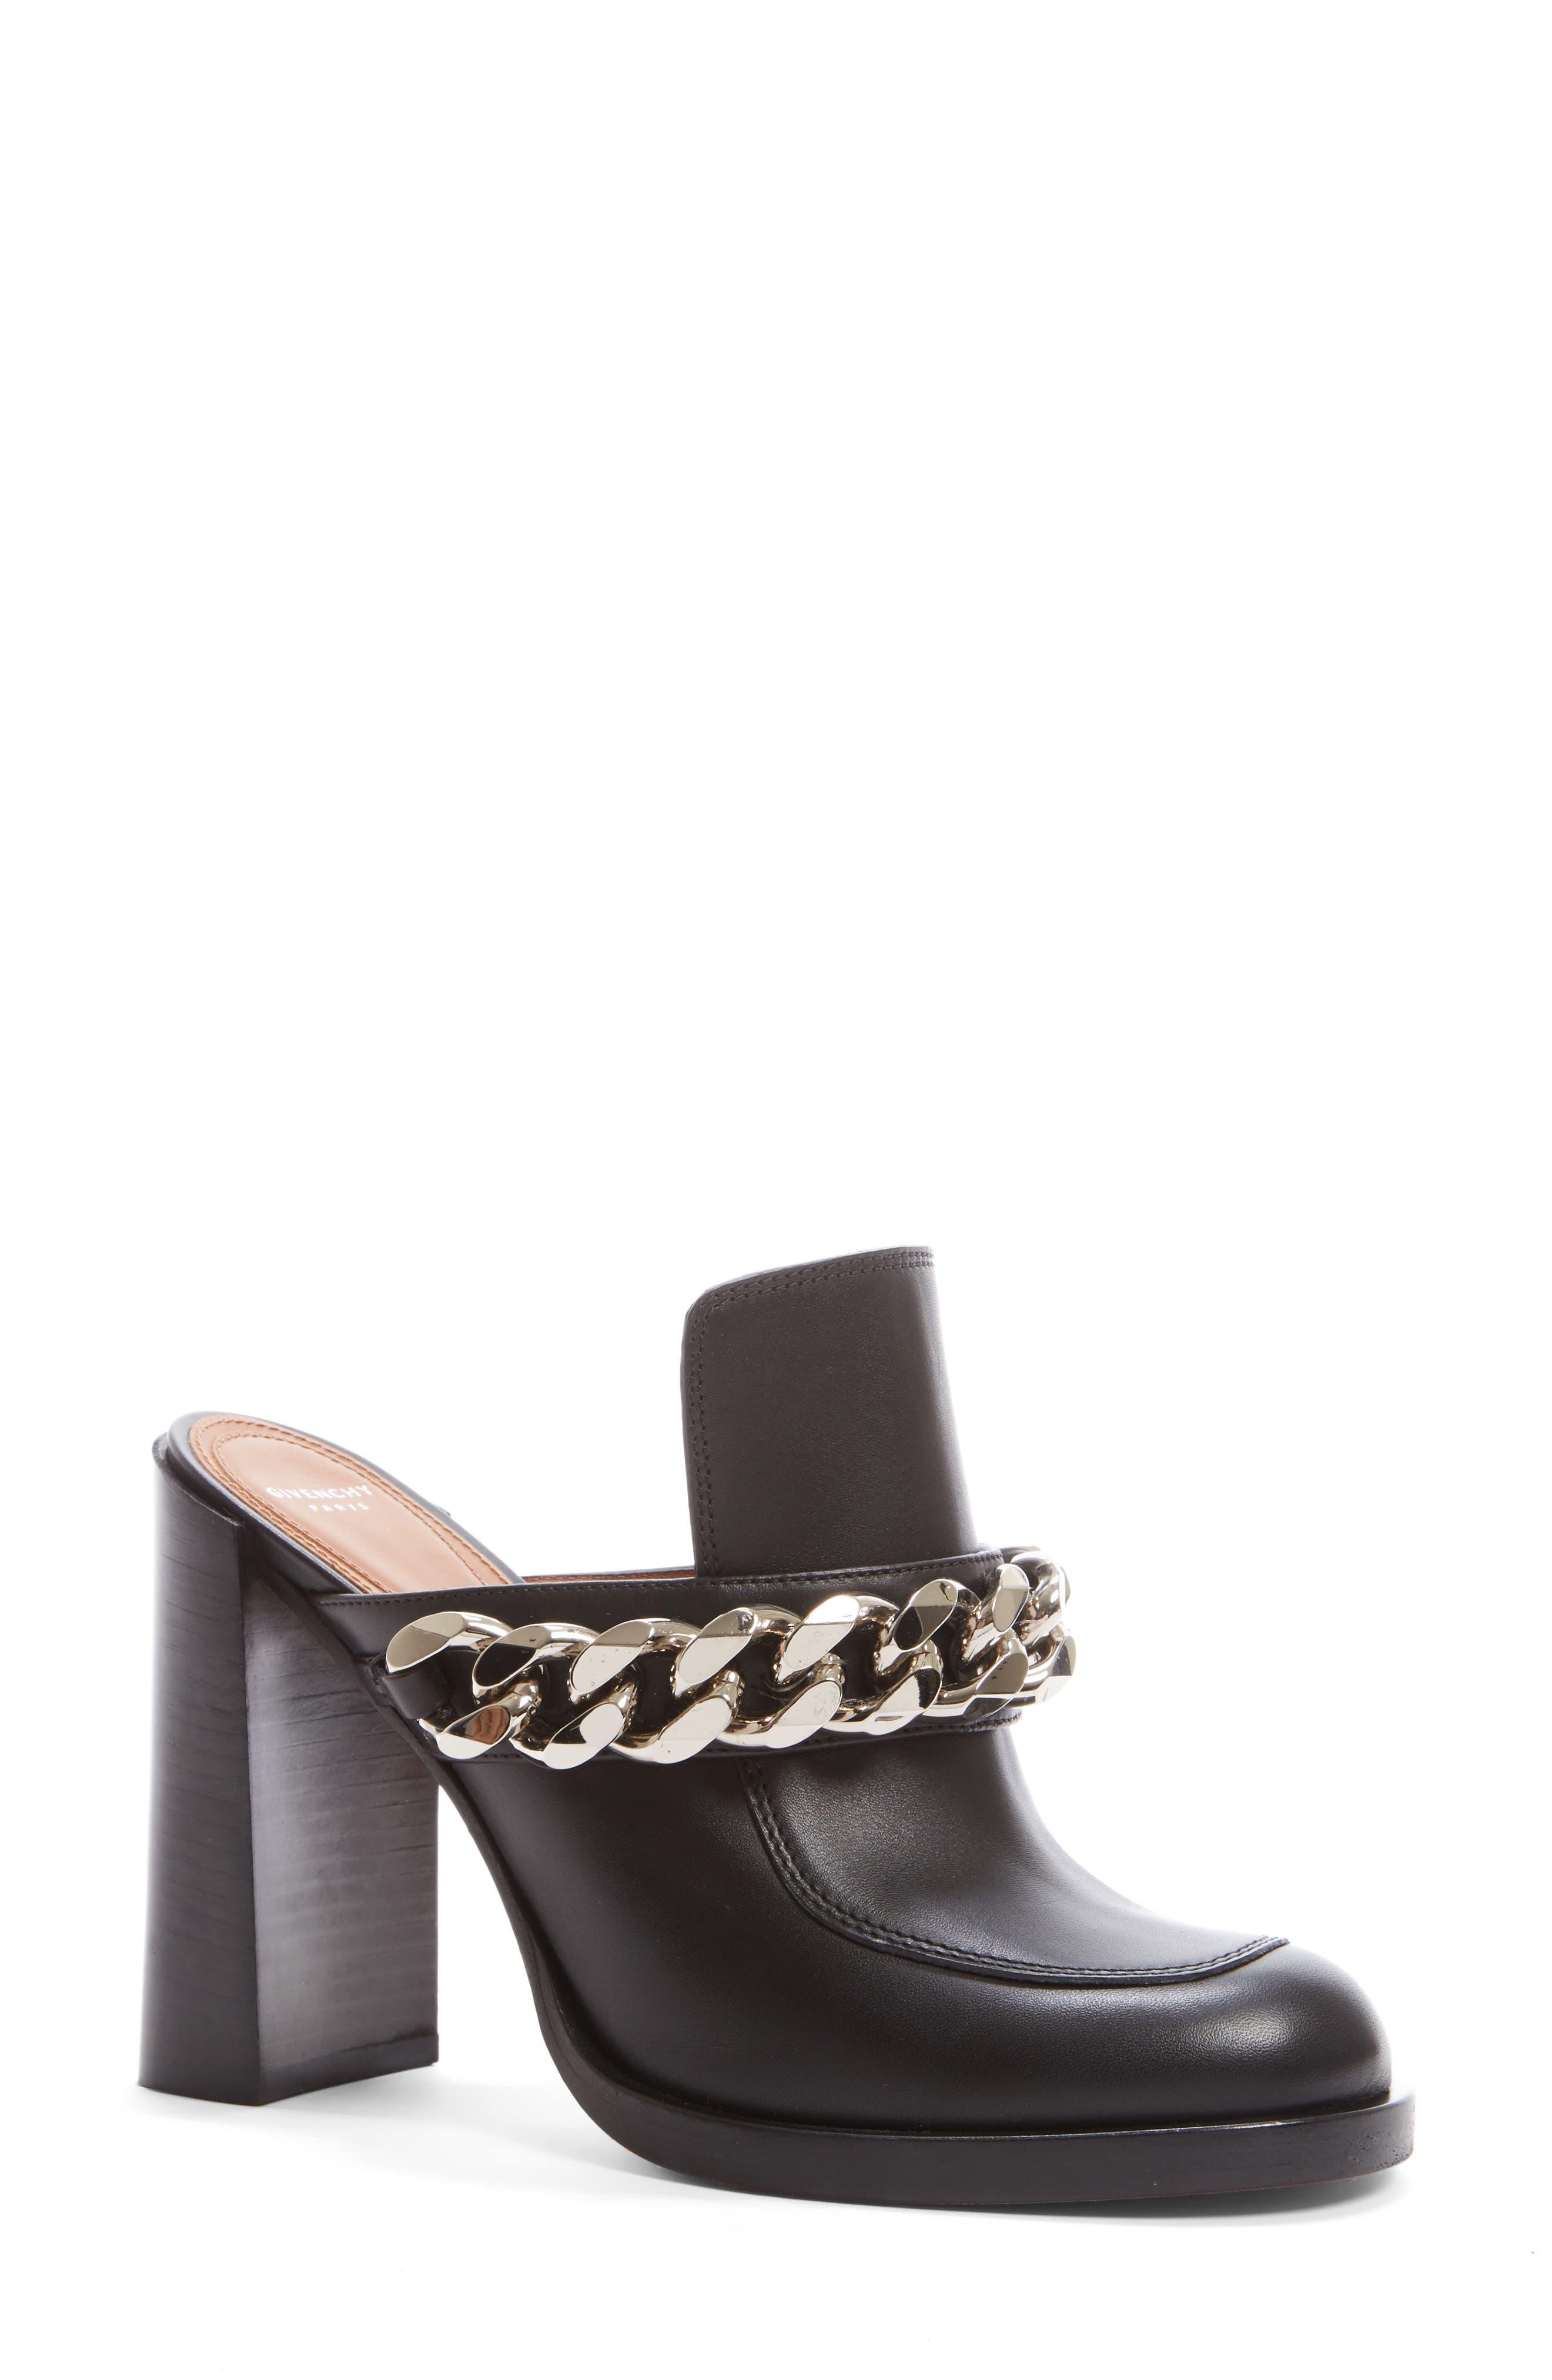 Main Image - Givenchy Chain Mule (Women)